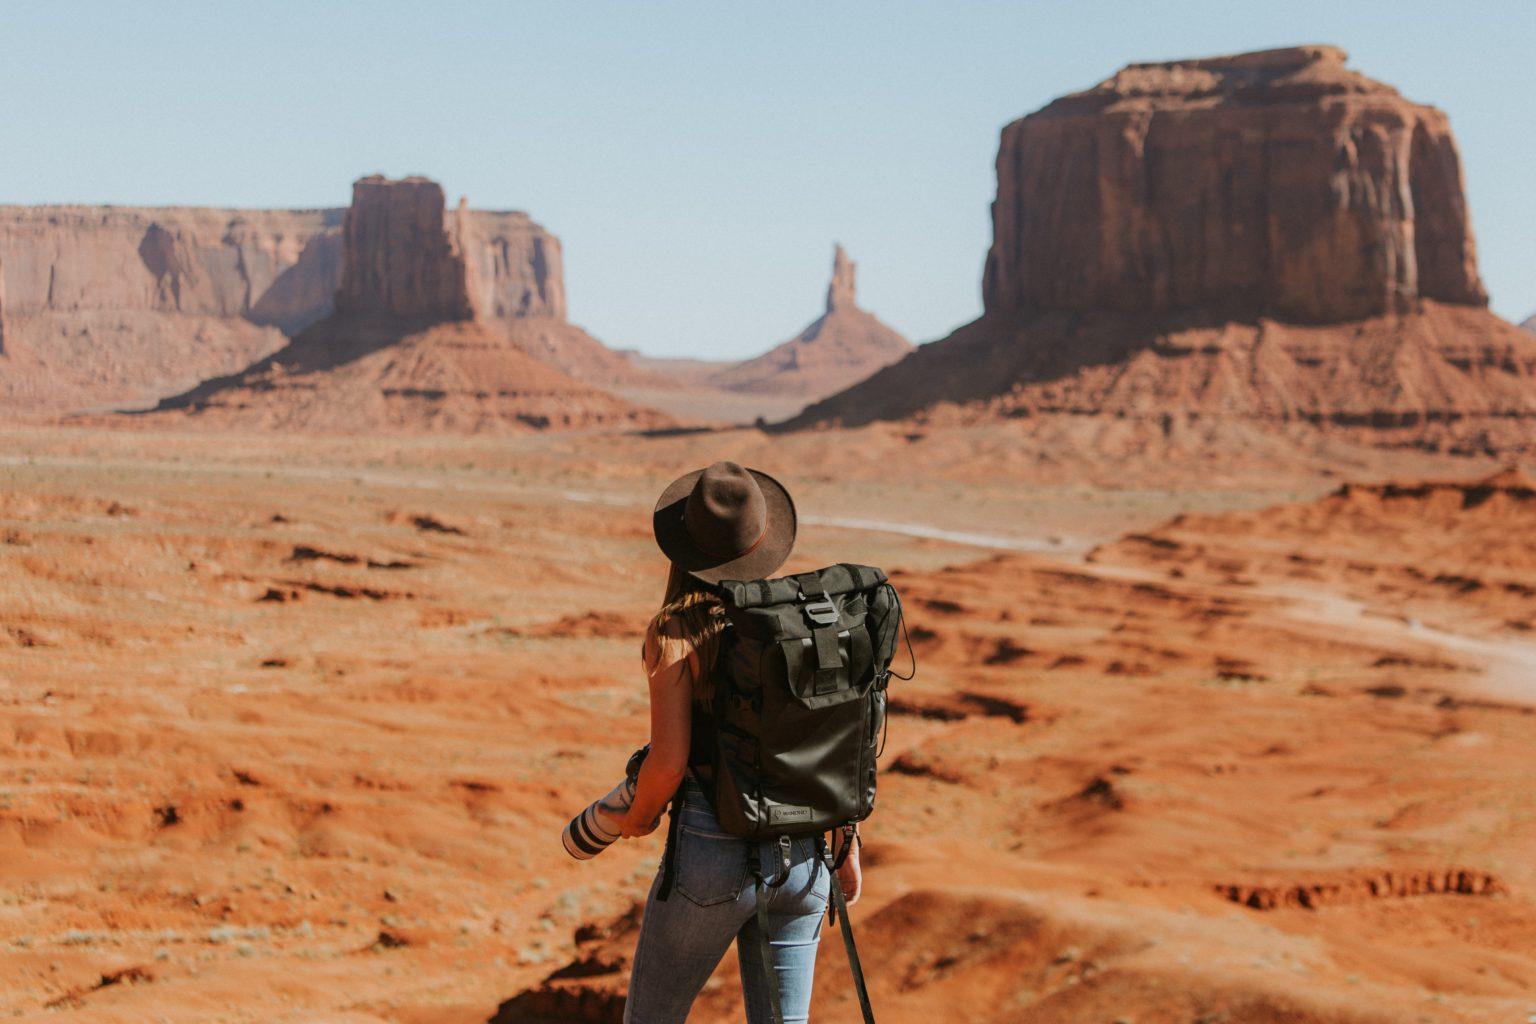 Abbildung zeigt Wanderer mit Rucksack Backpacking